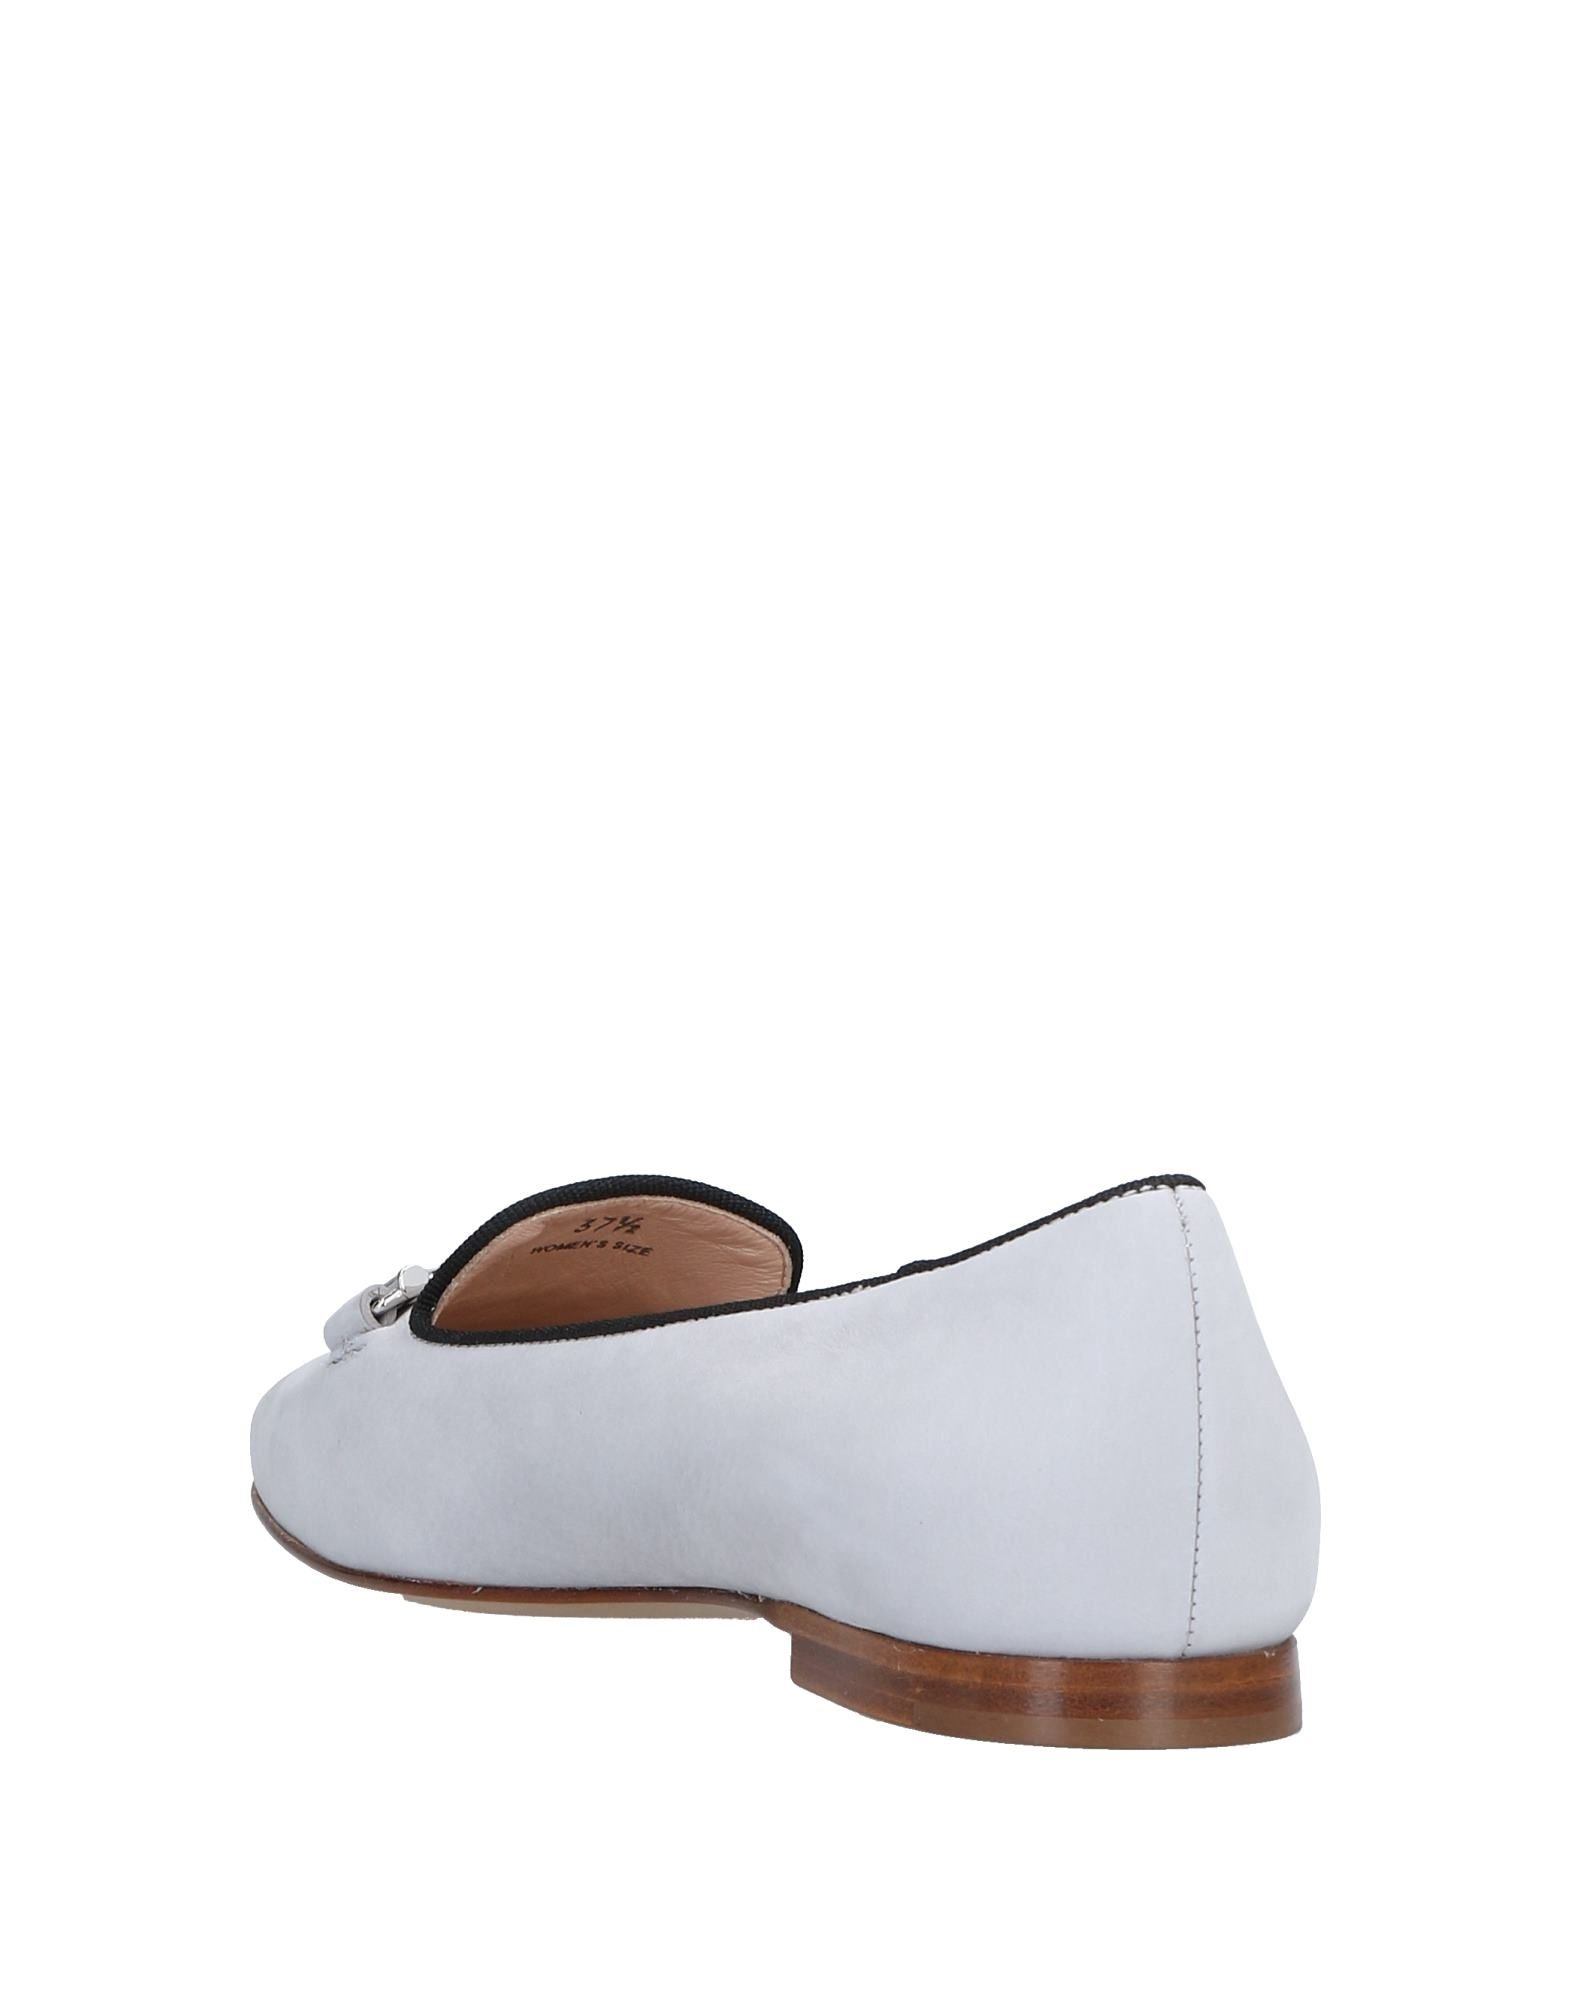 Tod's Mokassins 11542741OFGünstige Damen  11542741OFGünstige Mokassins gut aussehende Schuhe 7a2c4c